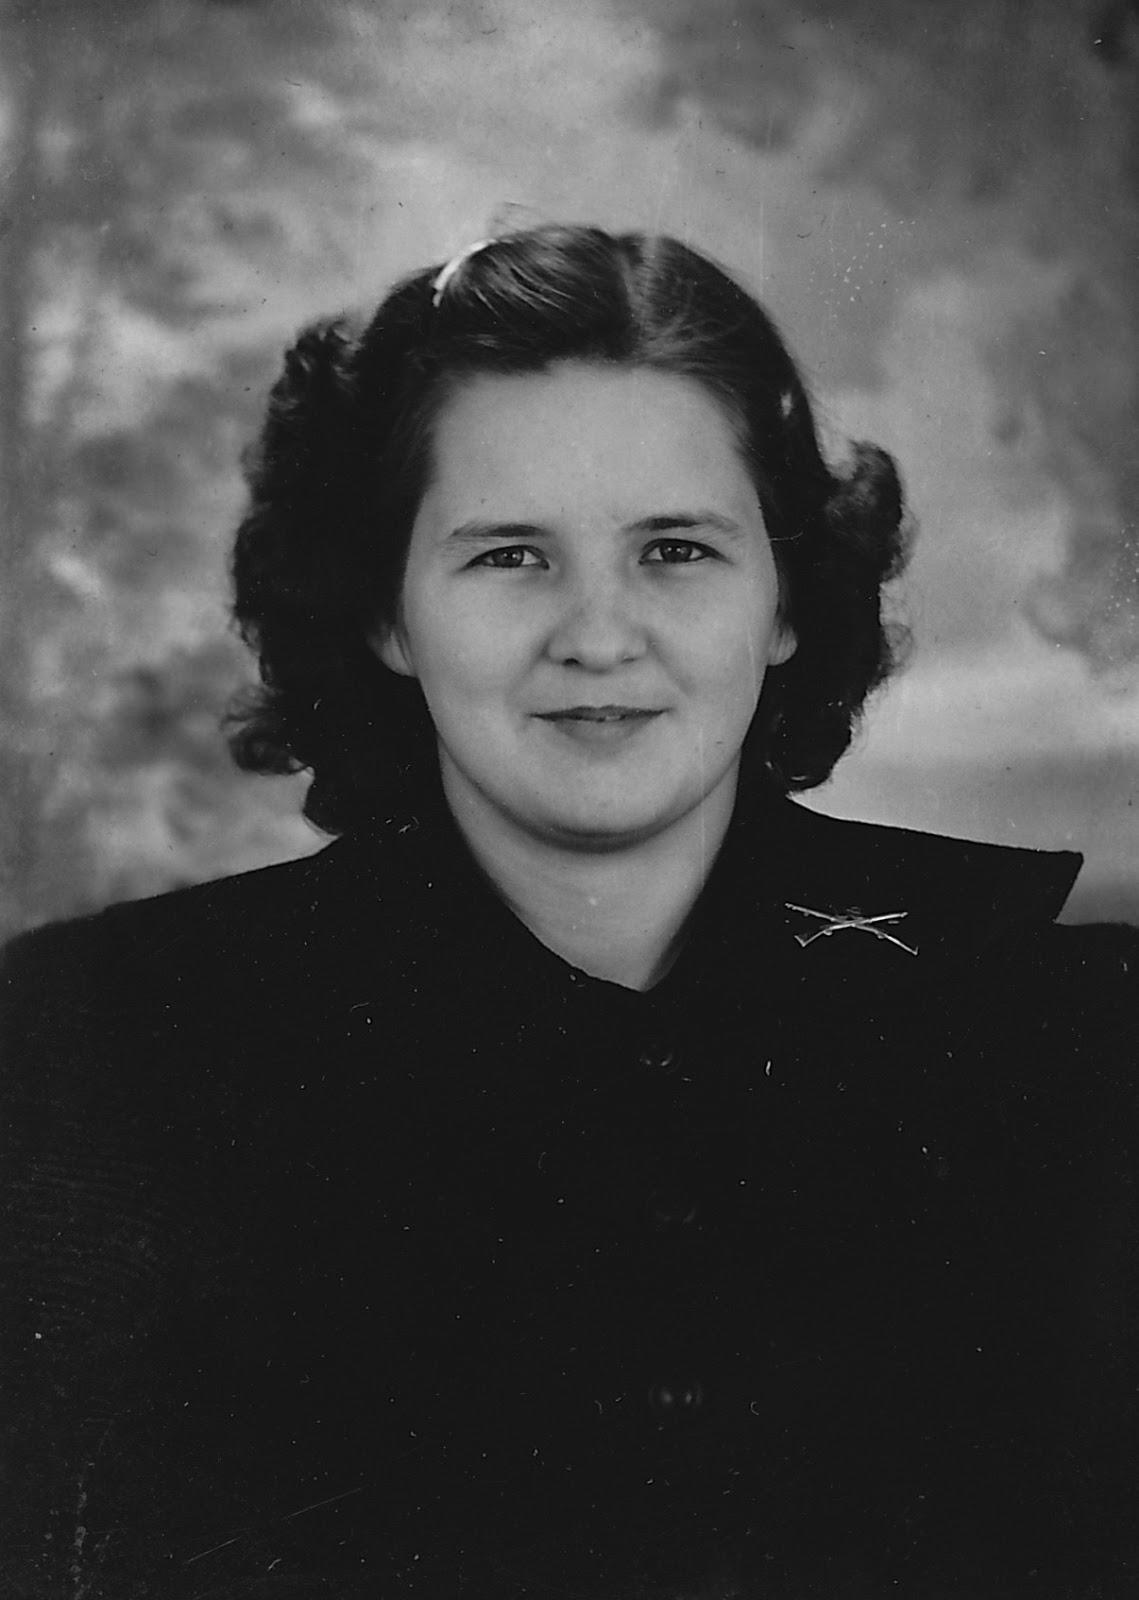 IN MEMORIAM: Daisy Belle Bradley Newsome, 1920 - 2016